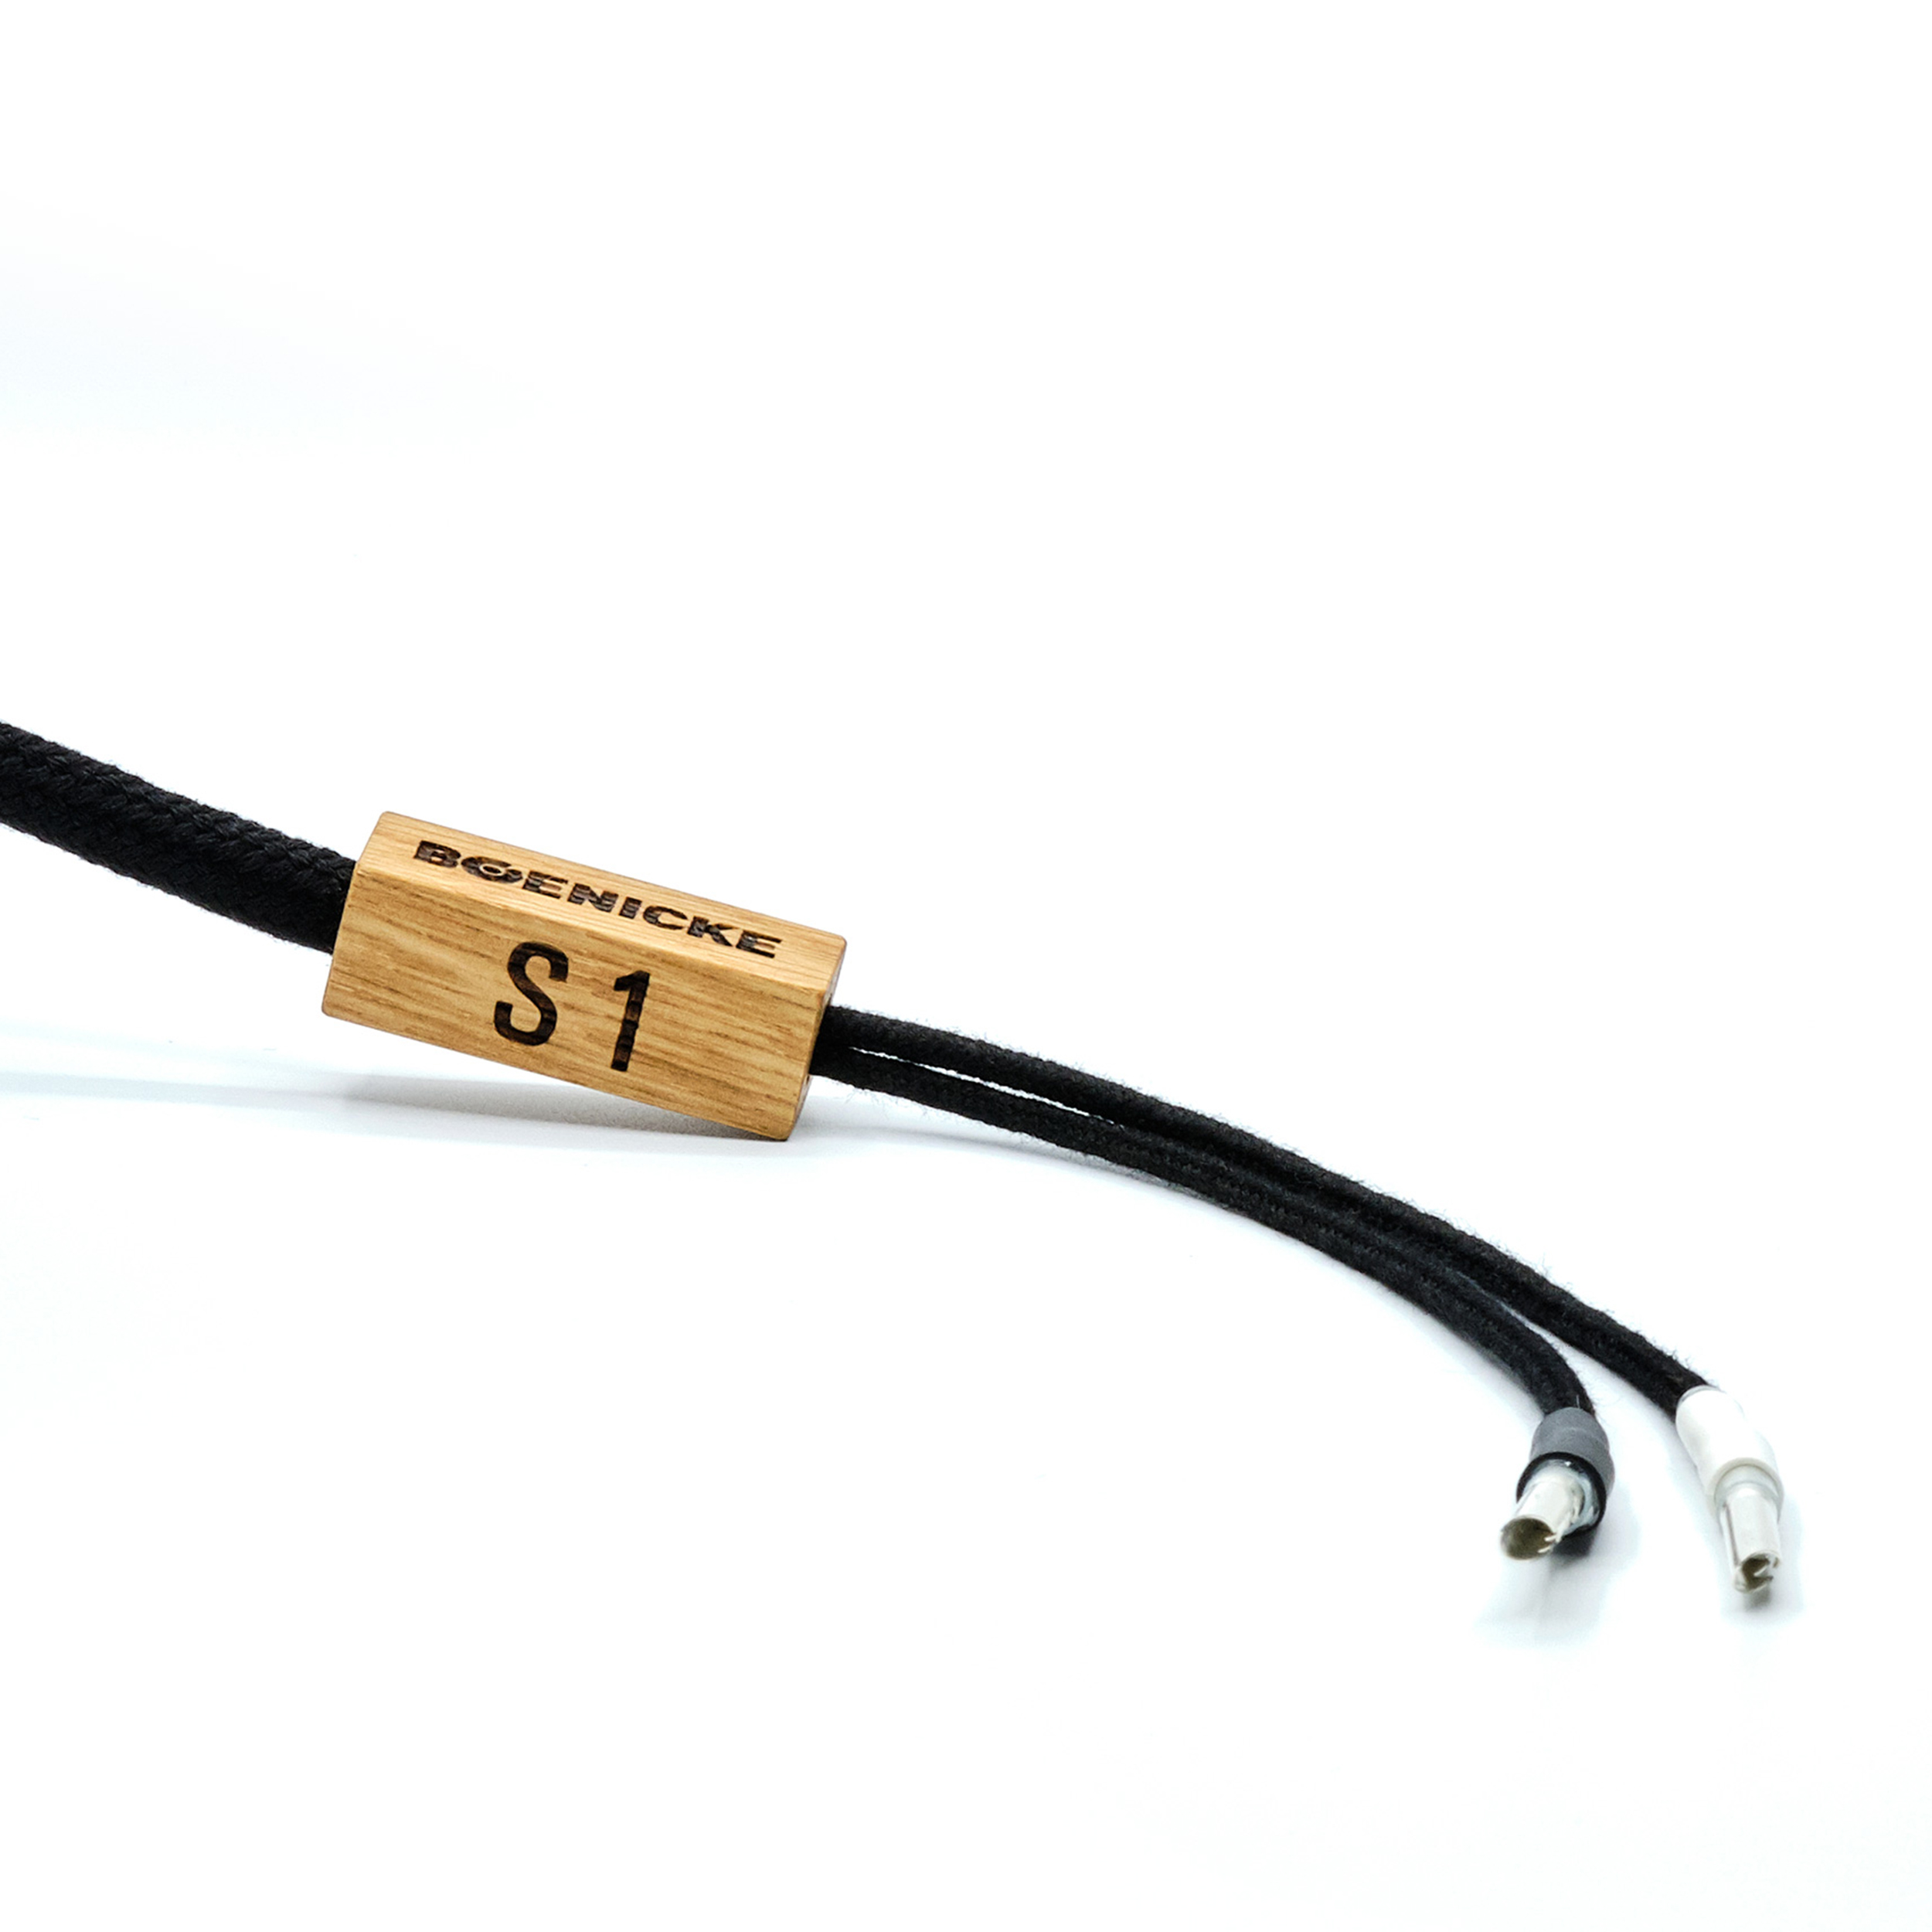 Boenicke S1 speaker kabel